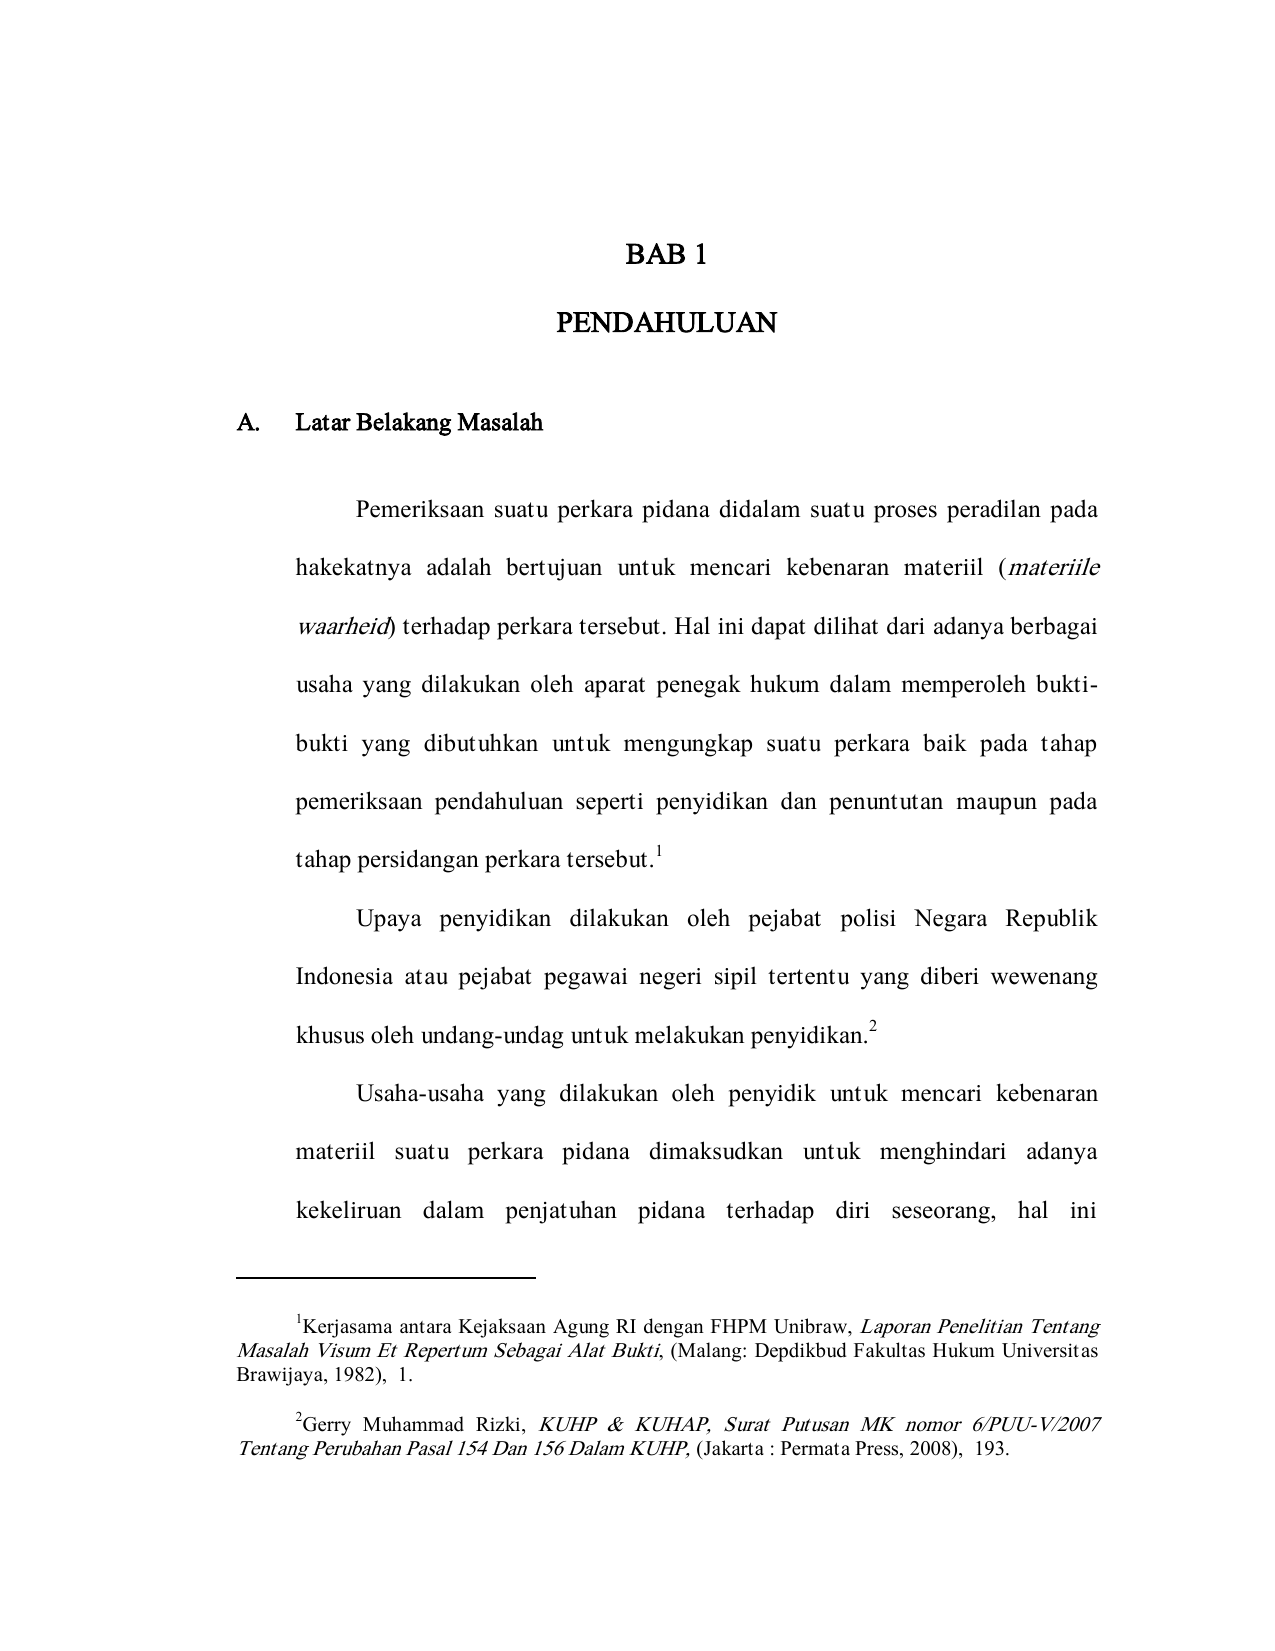 Bab 1 Pendahuluan Digilib Uin Sunan Ampel Surabaya